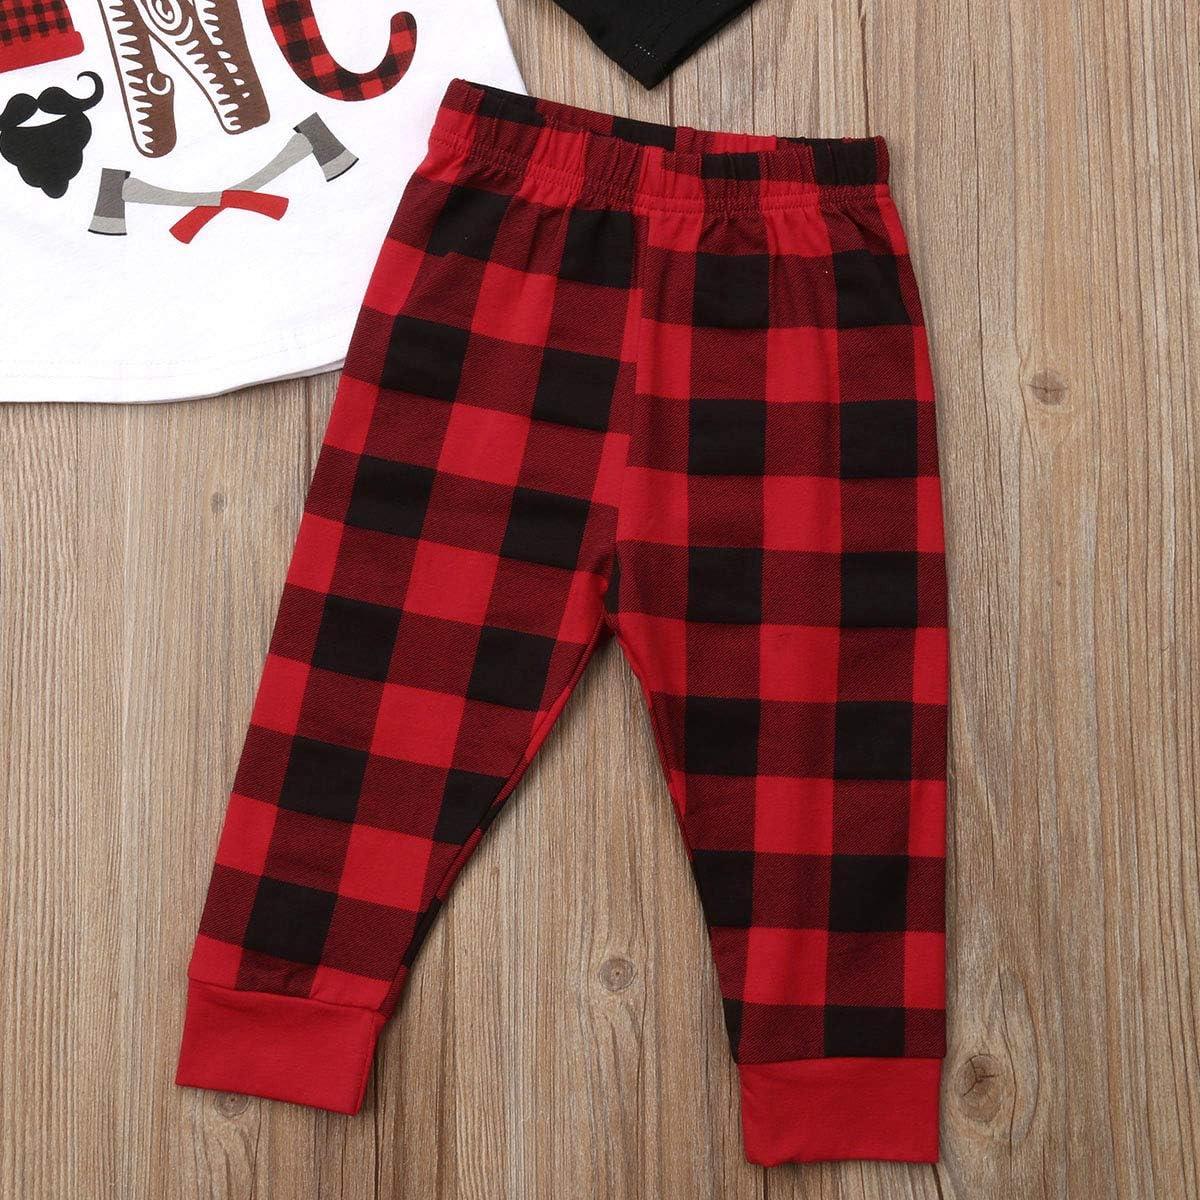 Newborn Baby Boys Girls Clothes Wild One Print Stitching Shirt Top+Red Black Plaid Long Pants Christmas 2pcs Outfits Set